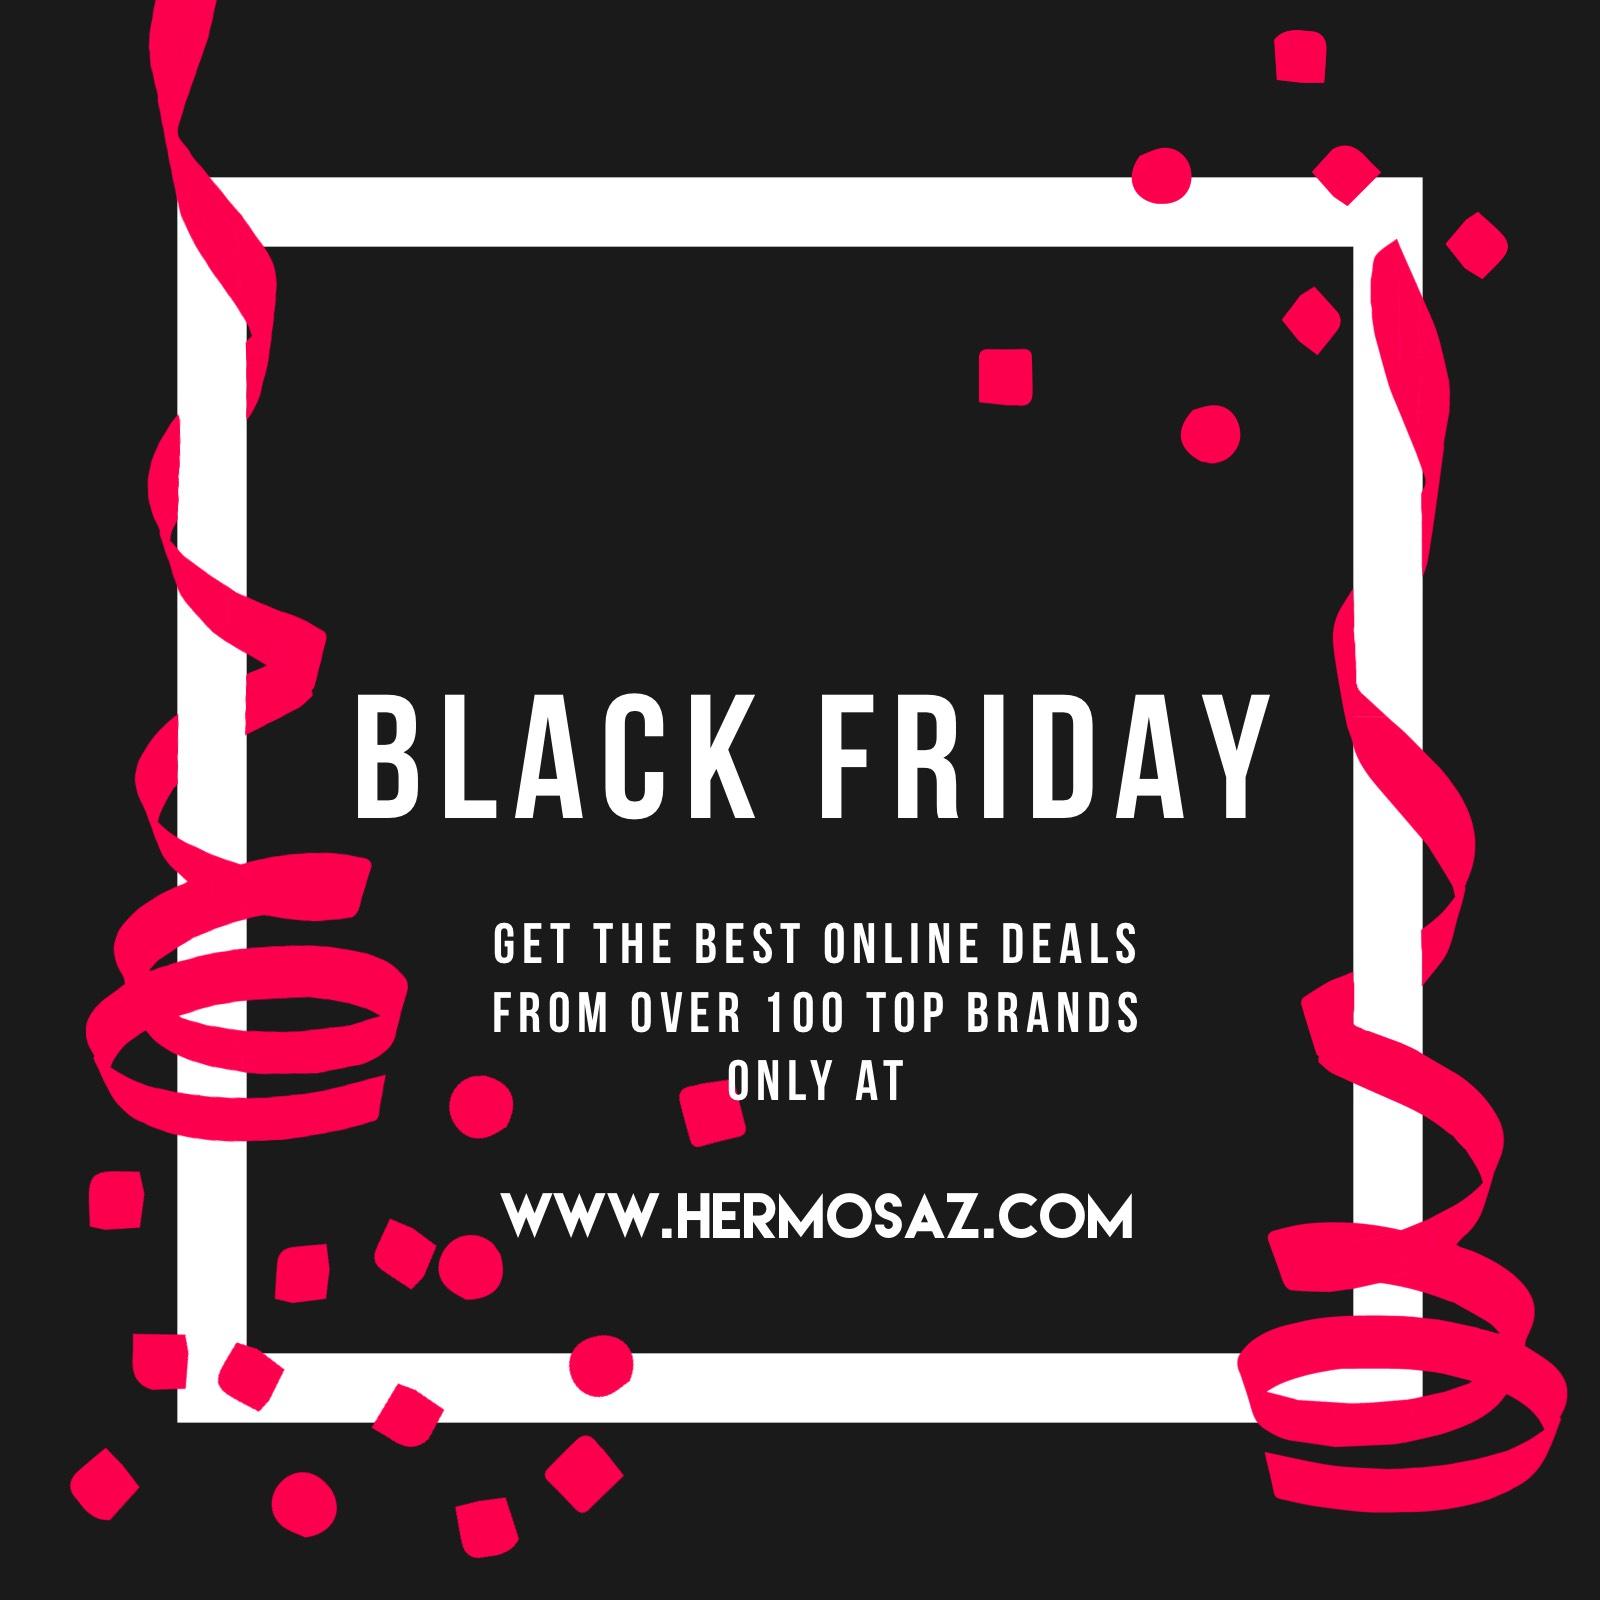 213ea89198a Black-Friday-Deals - Hermosaz